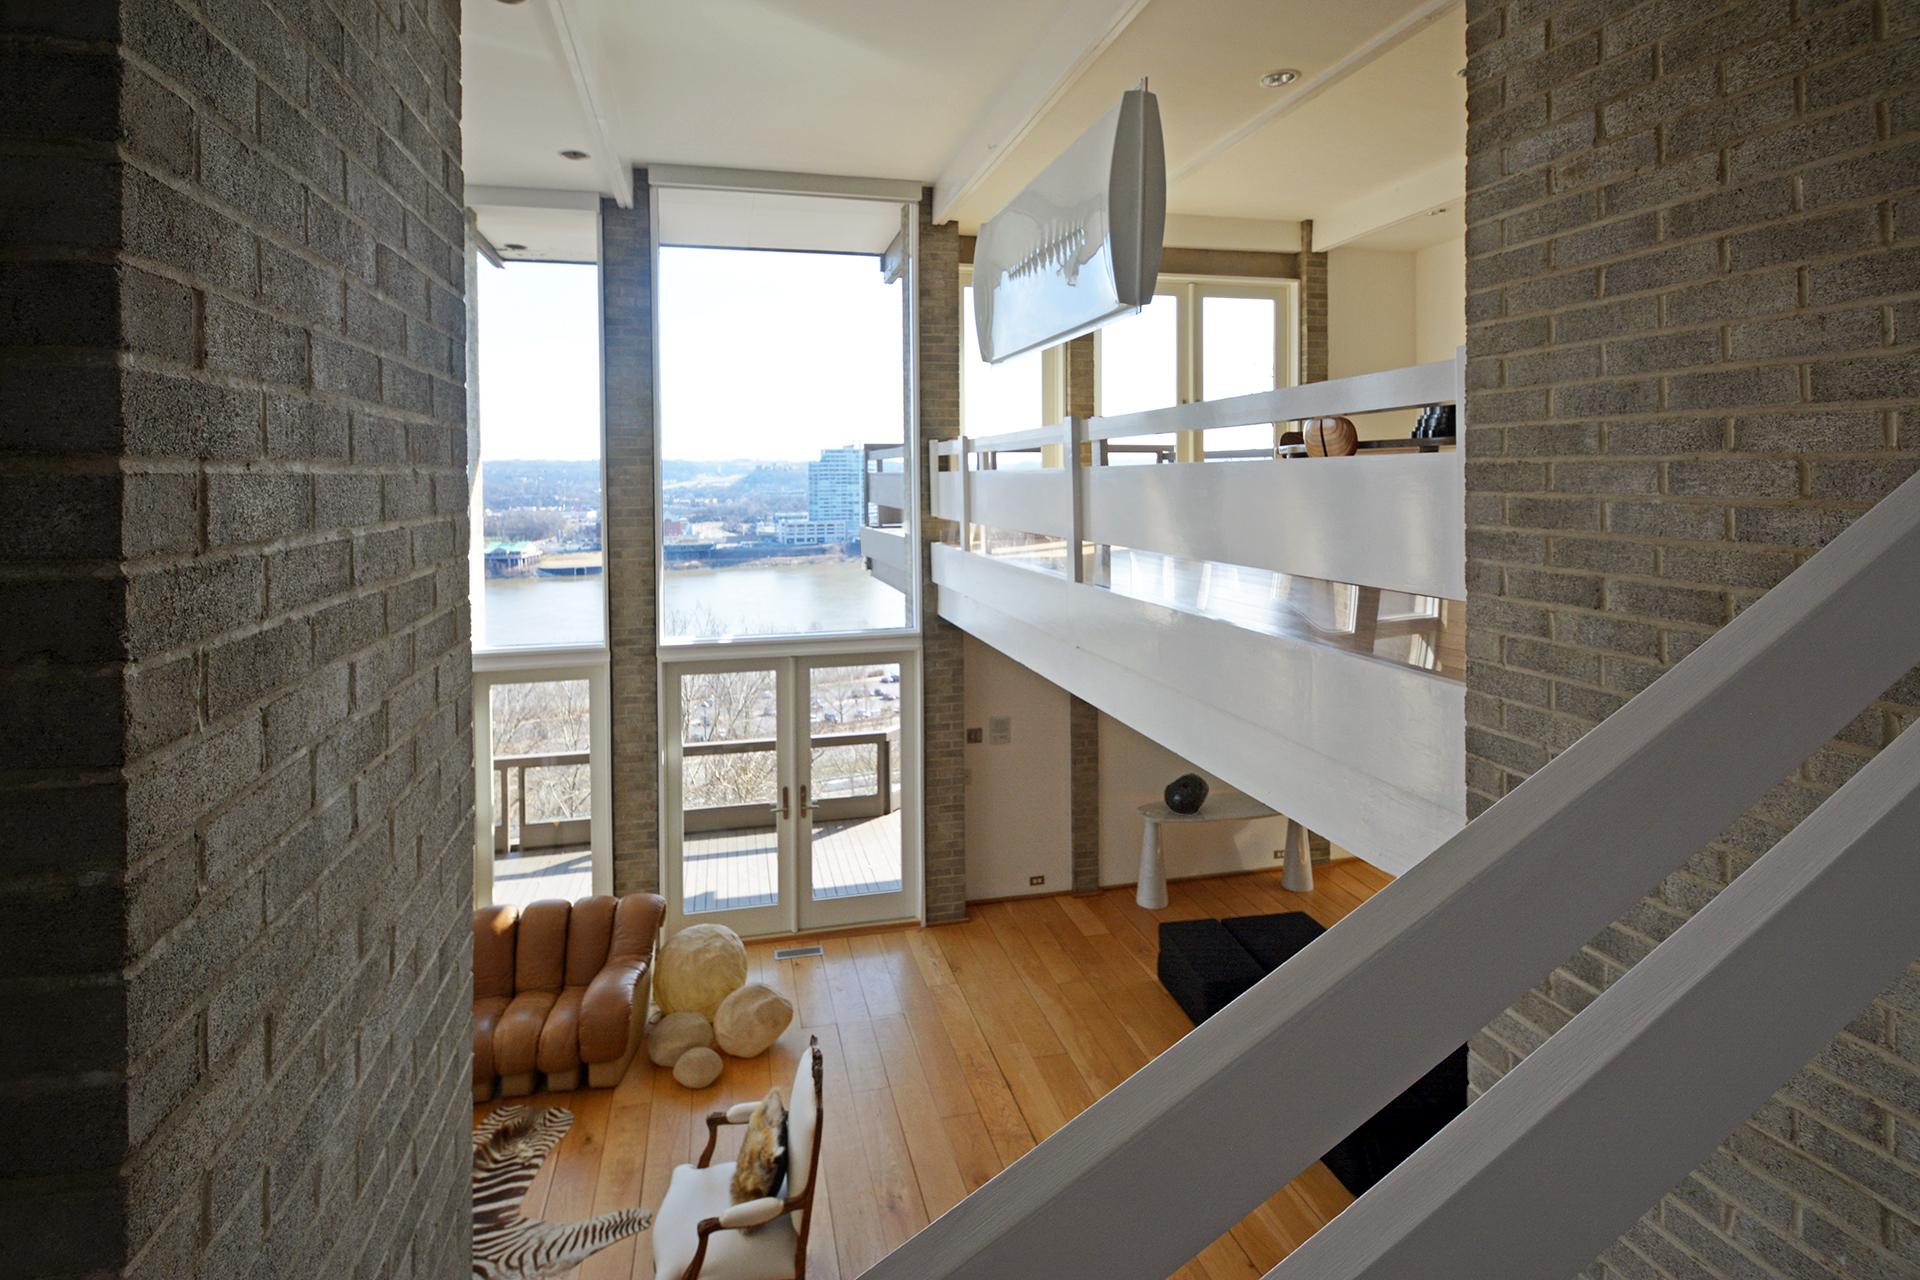 Vidal Sassoon S Contemporary Cincinnati Home Up For Sale